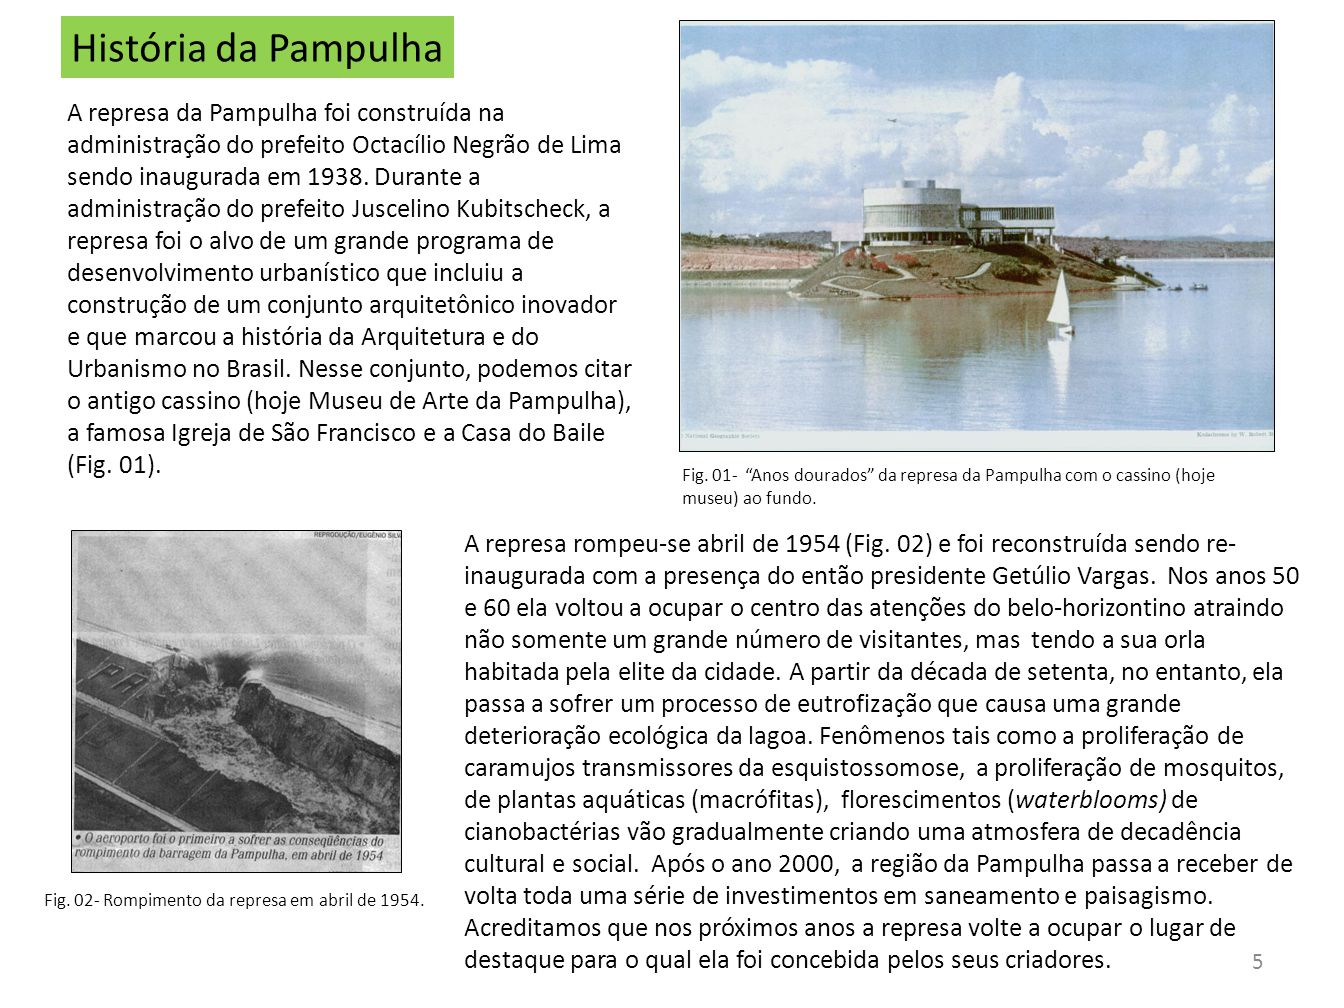 História da Pampulha